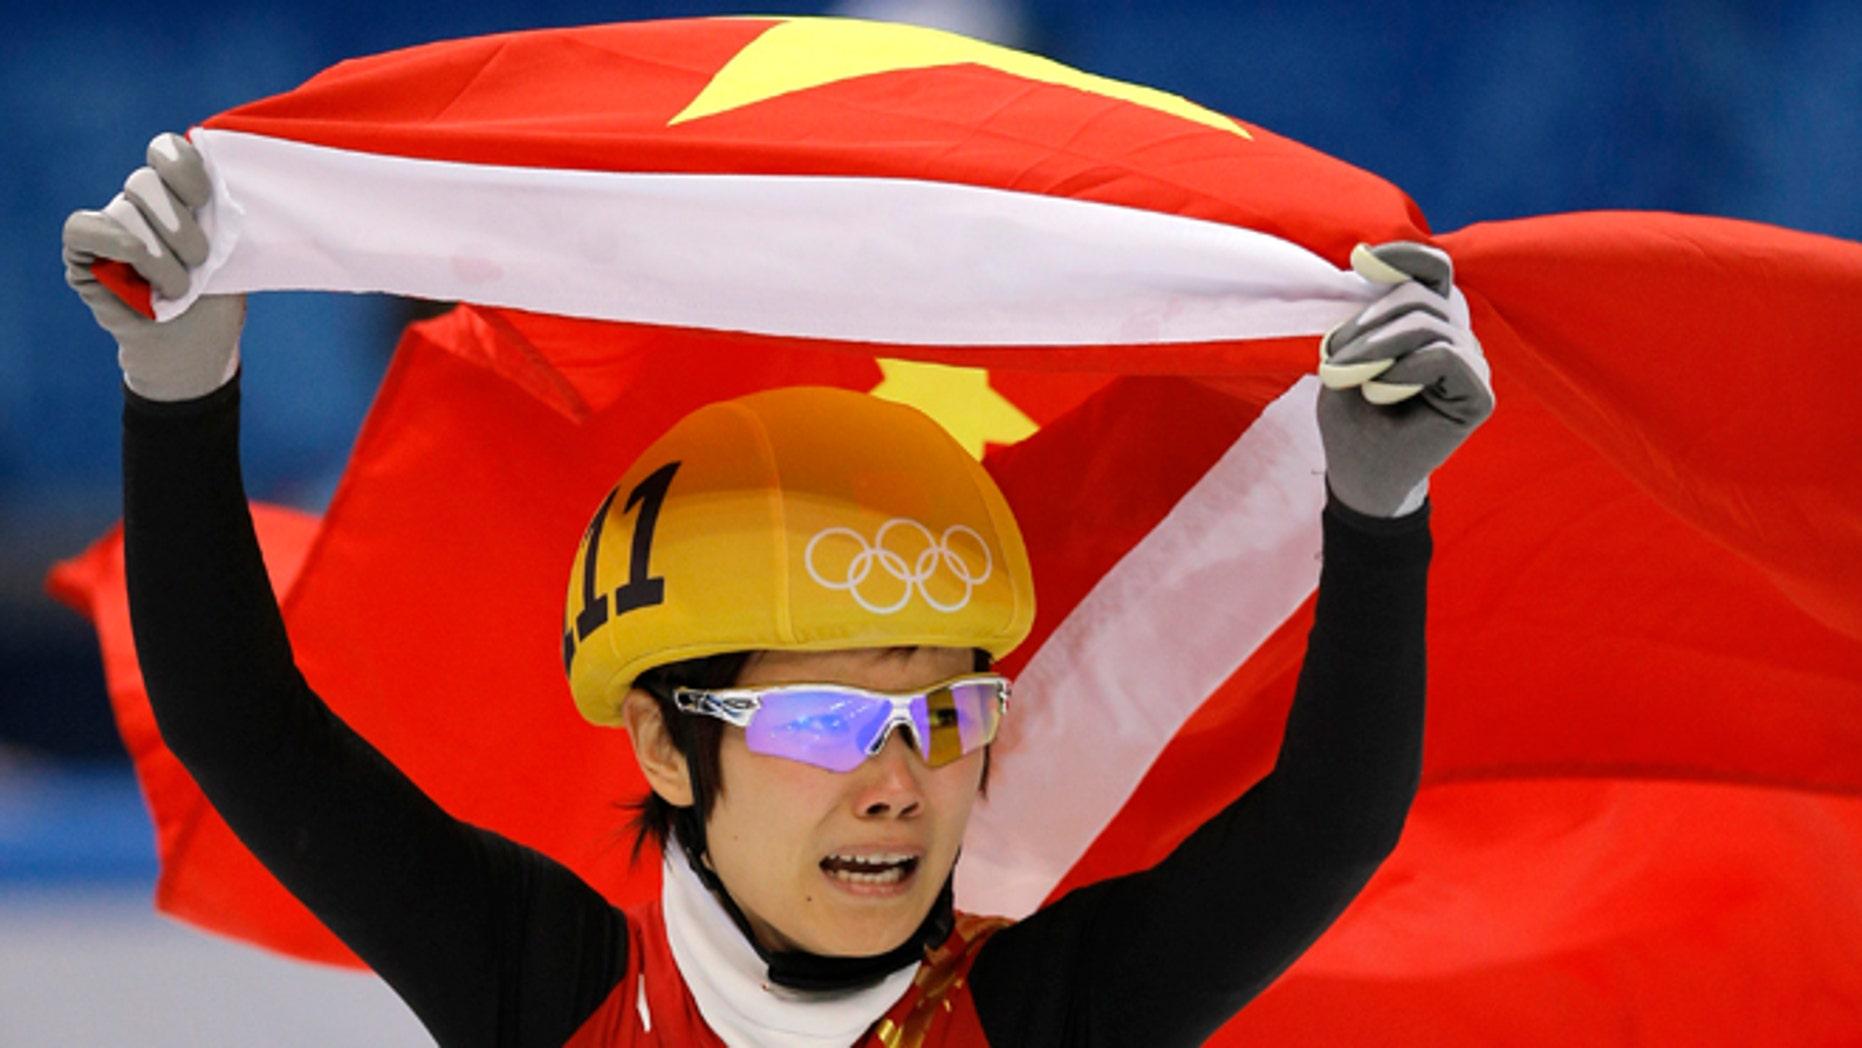 Feb. 13, 2014: Li Jianrou of China celebrates winning the women's 500m short track speedskating final at the Iceberg Skating Palace during the 2014 Winter Olympics in Sochi, Russia.